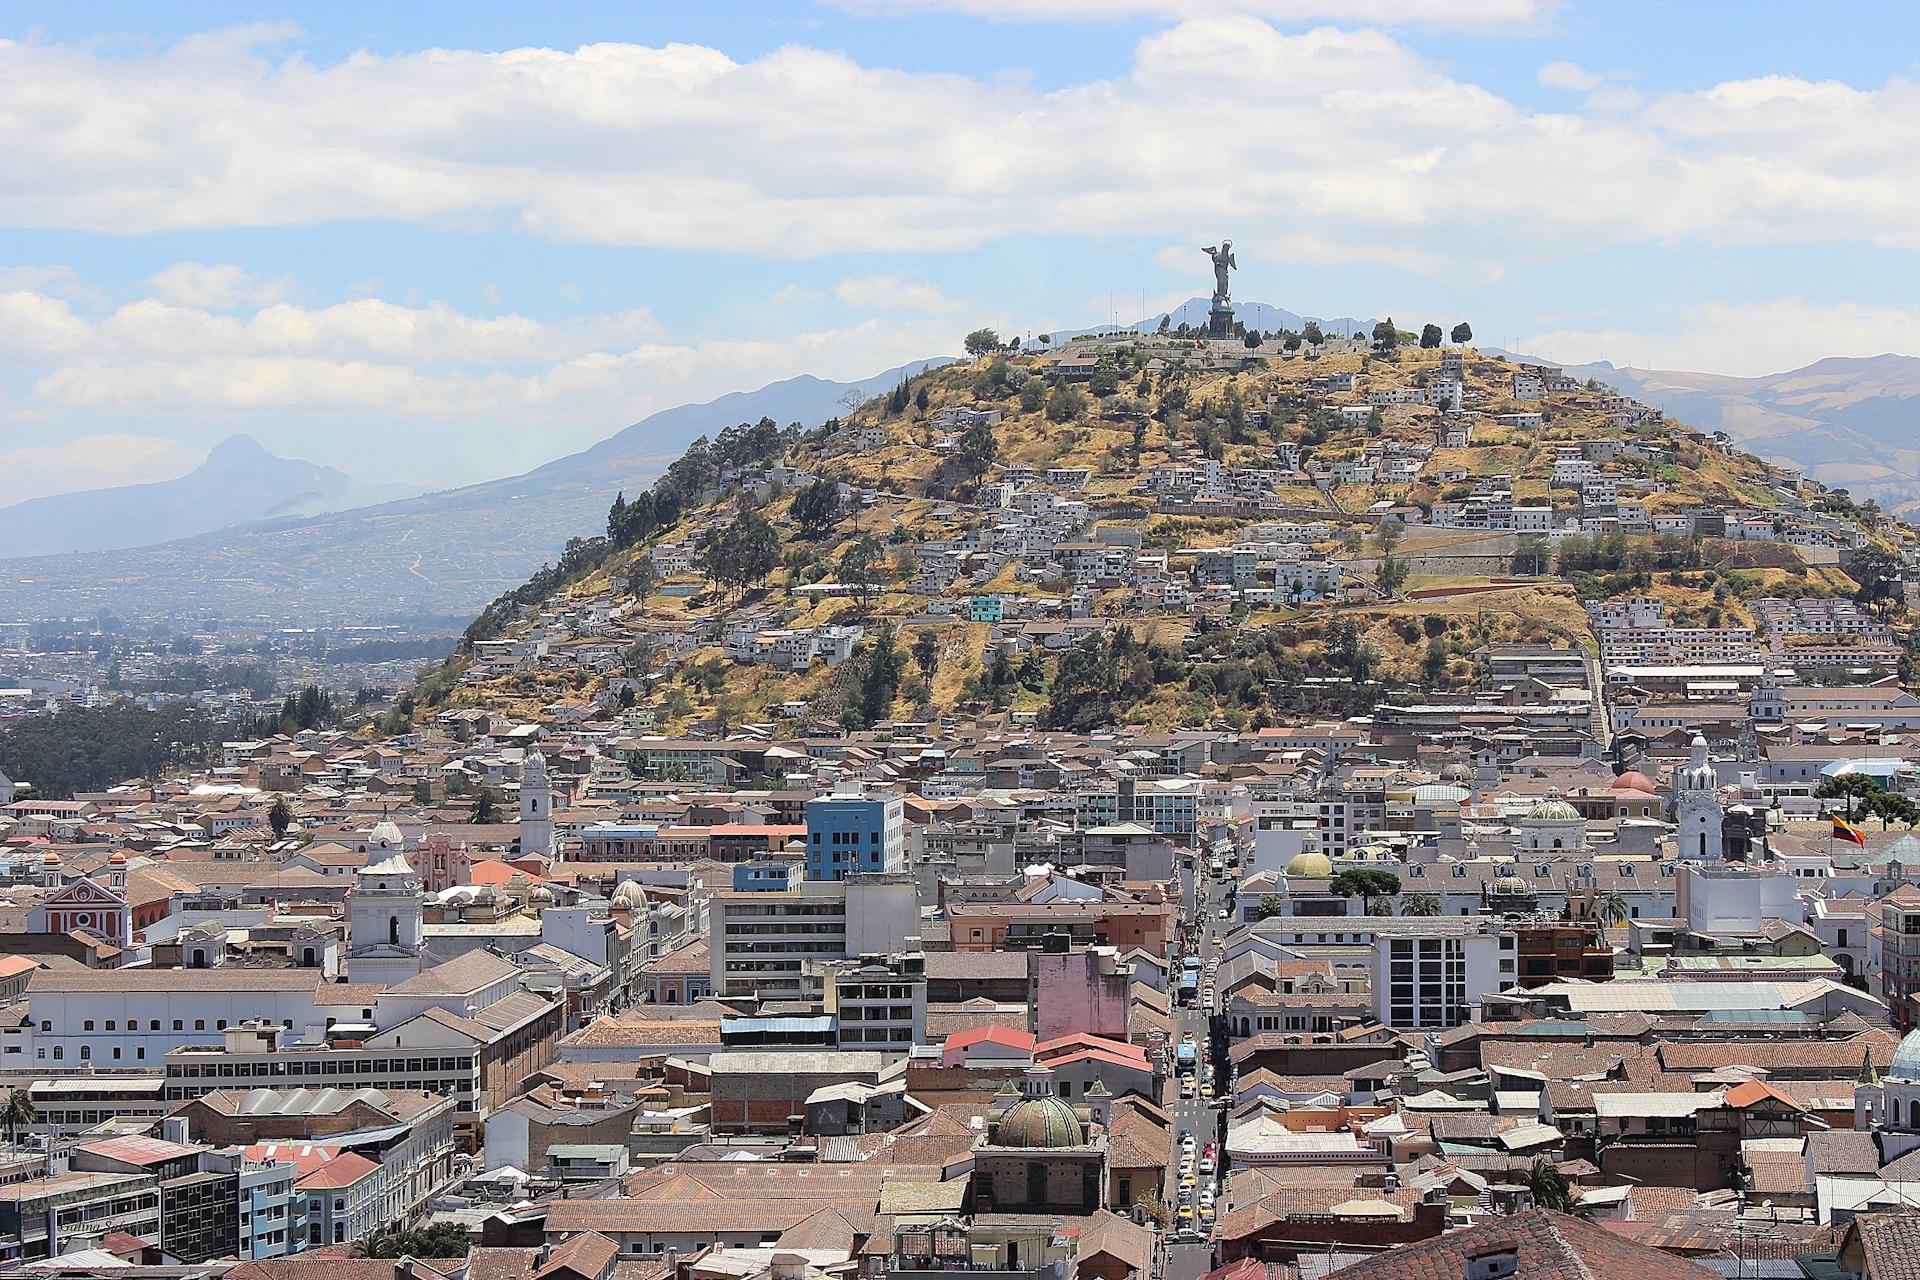 Mirador del Panecillo, Quito.